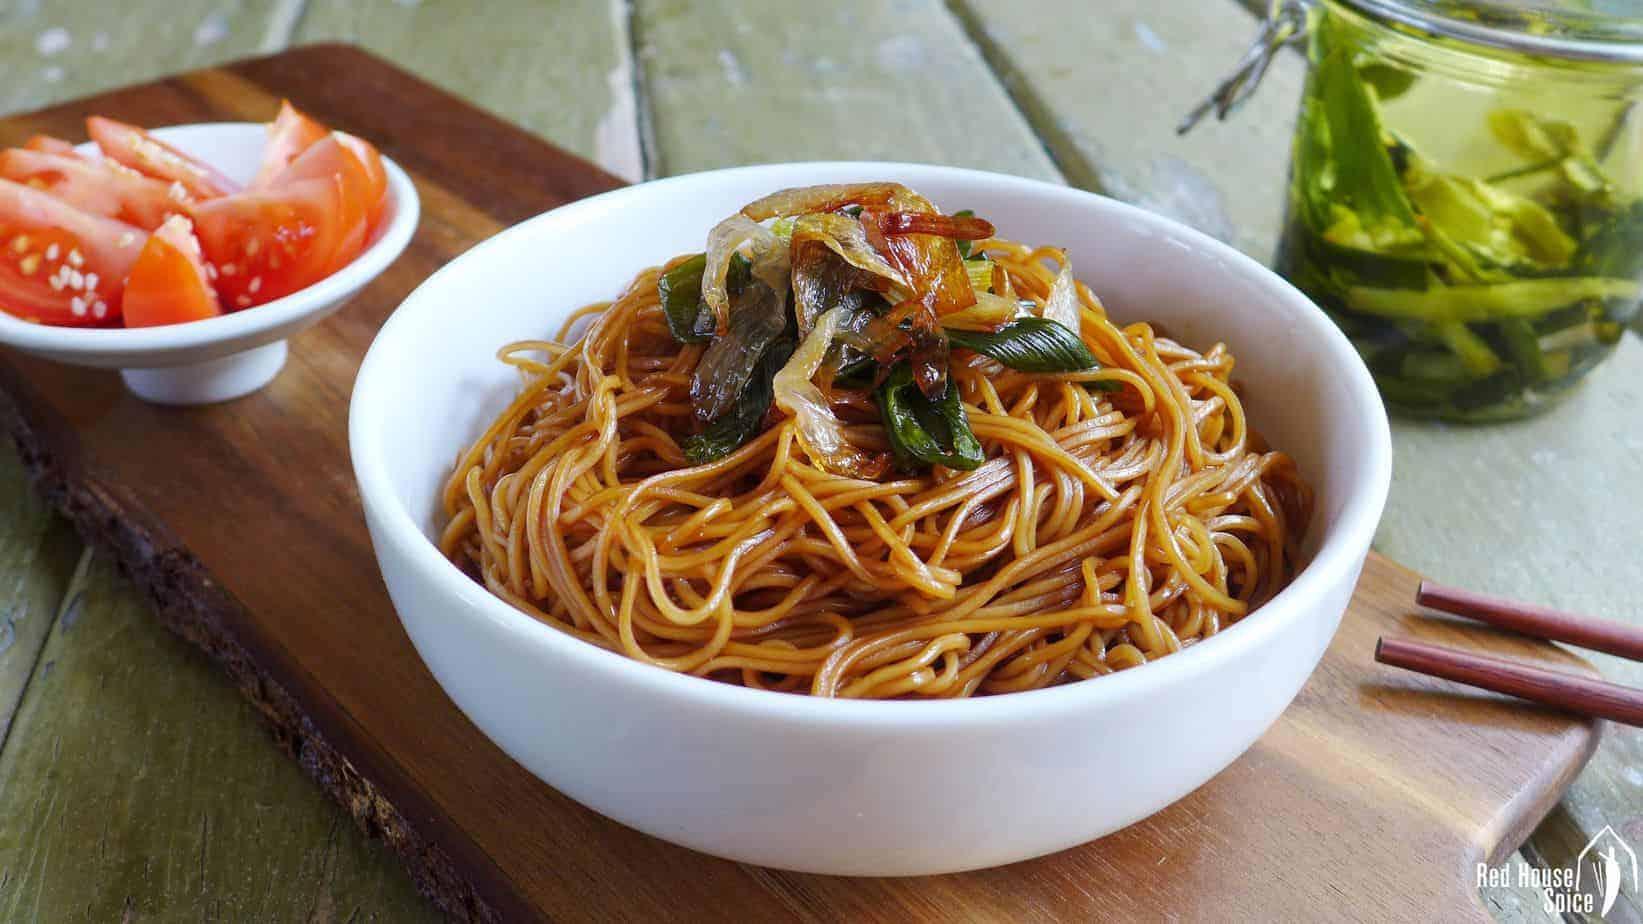 Shanghai spring onion oil noodles (葱油拌面)